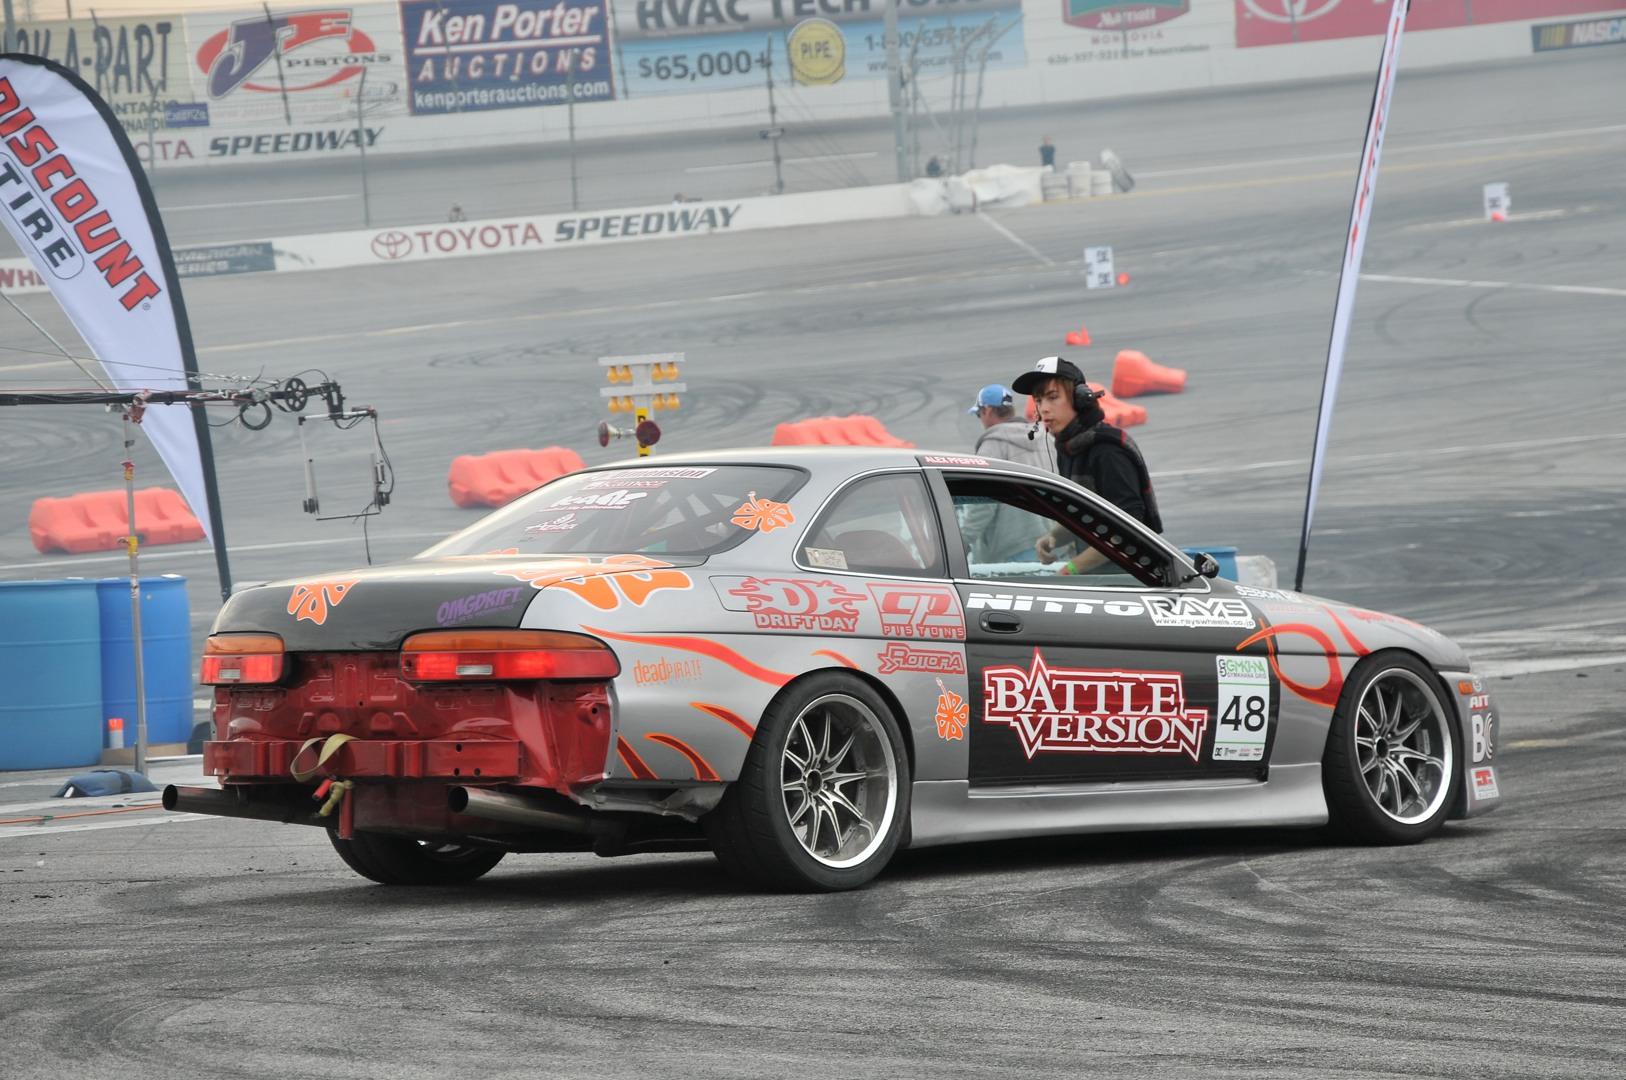 Alex Pfeiffer, Lexus Soarer, Battle Version, gymkhana